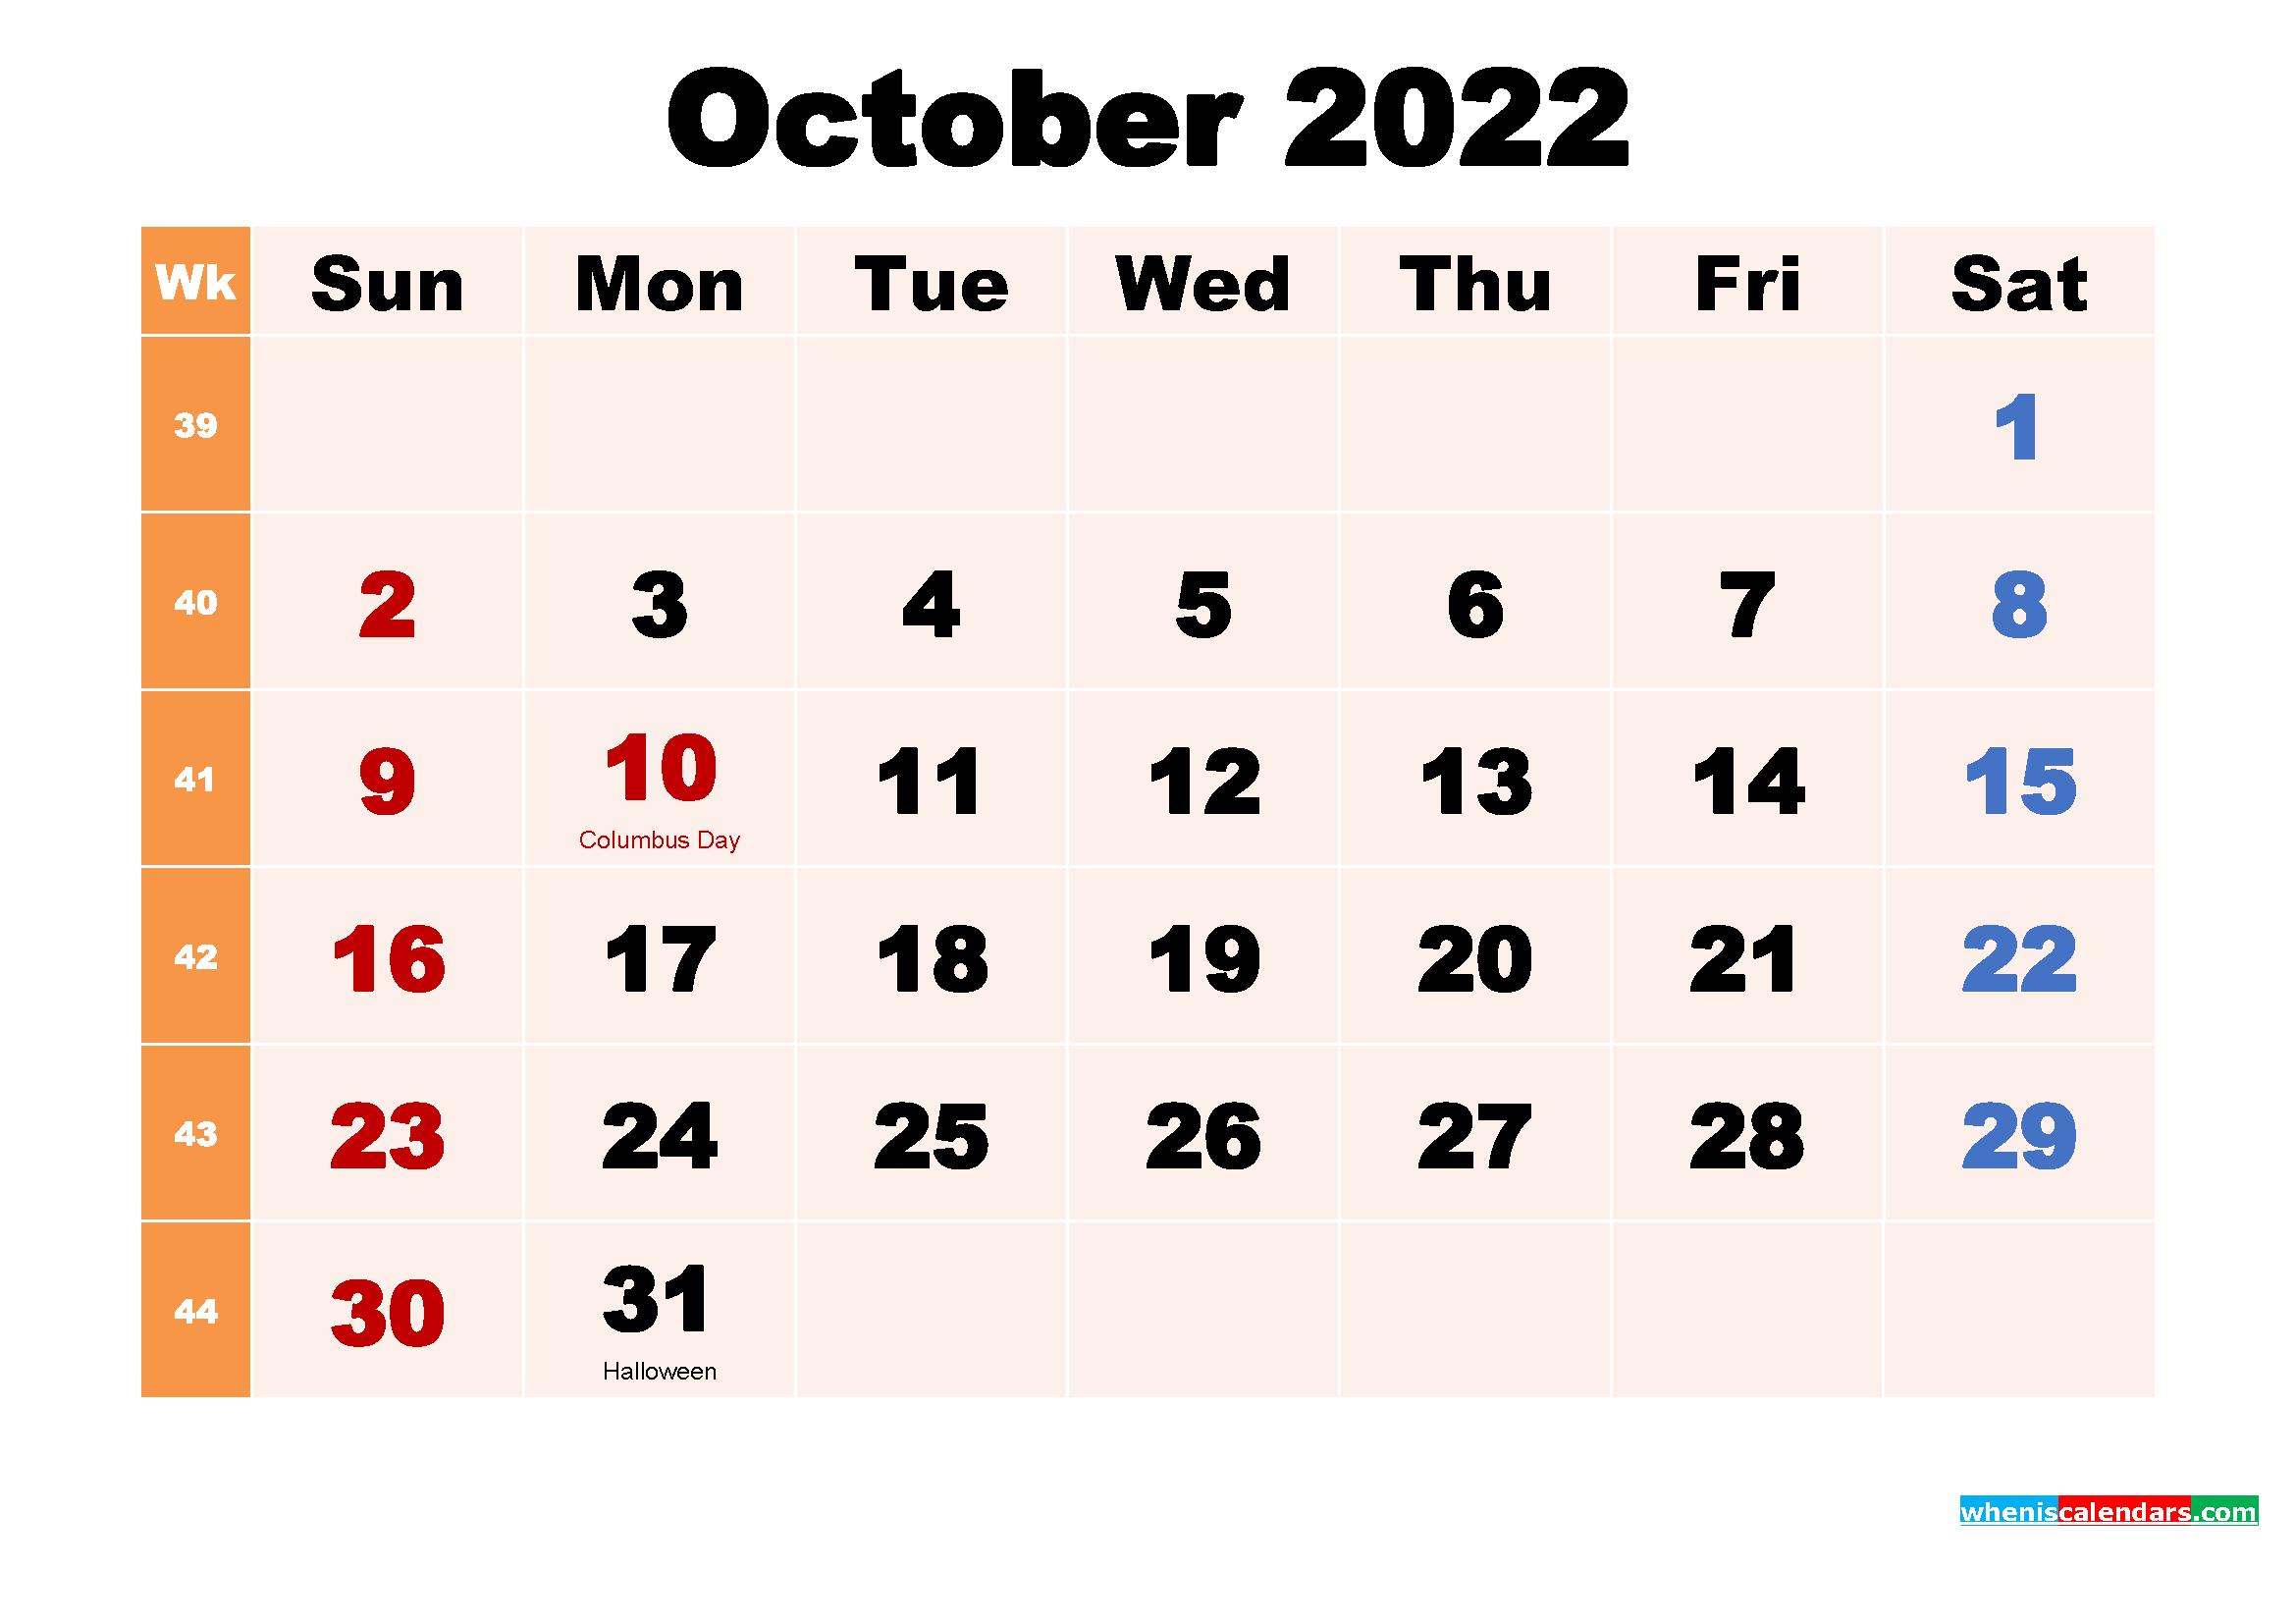 October 2022 Desktop Calendar With Holidays with regard to October 2022 Planner Calendar Graphics